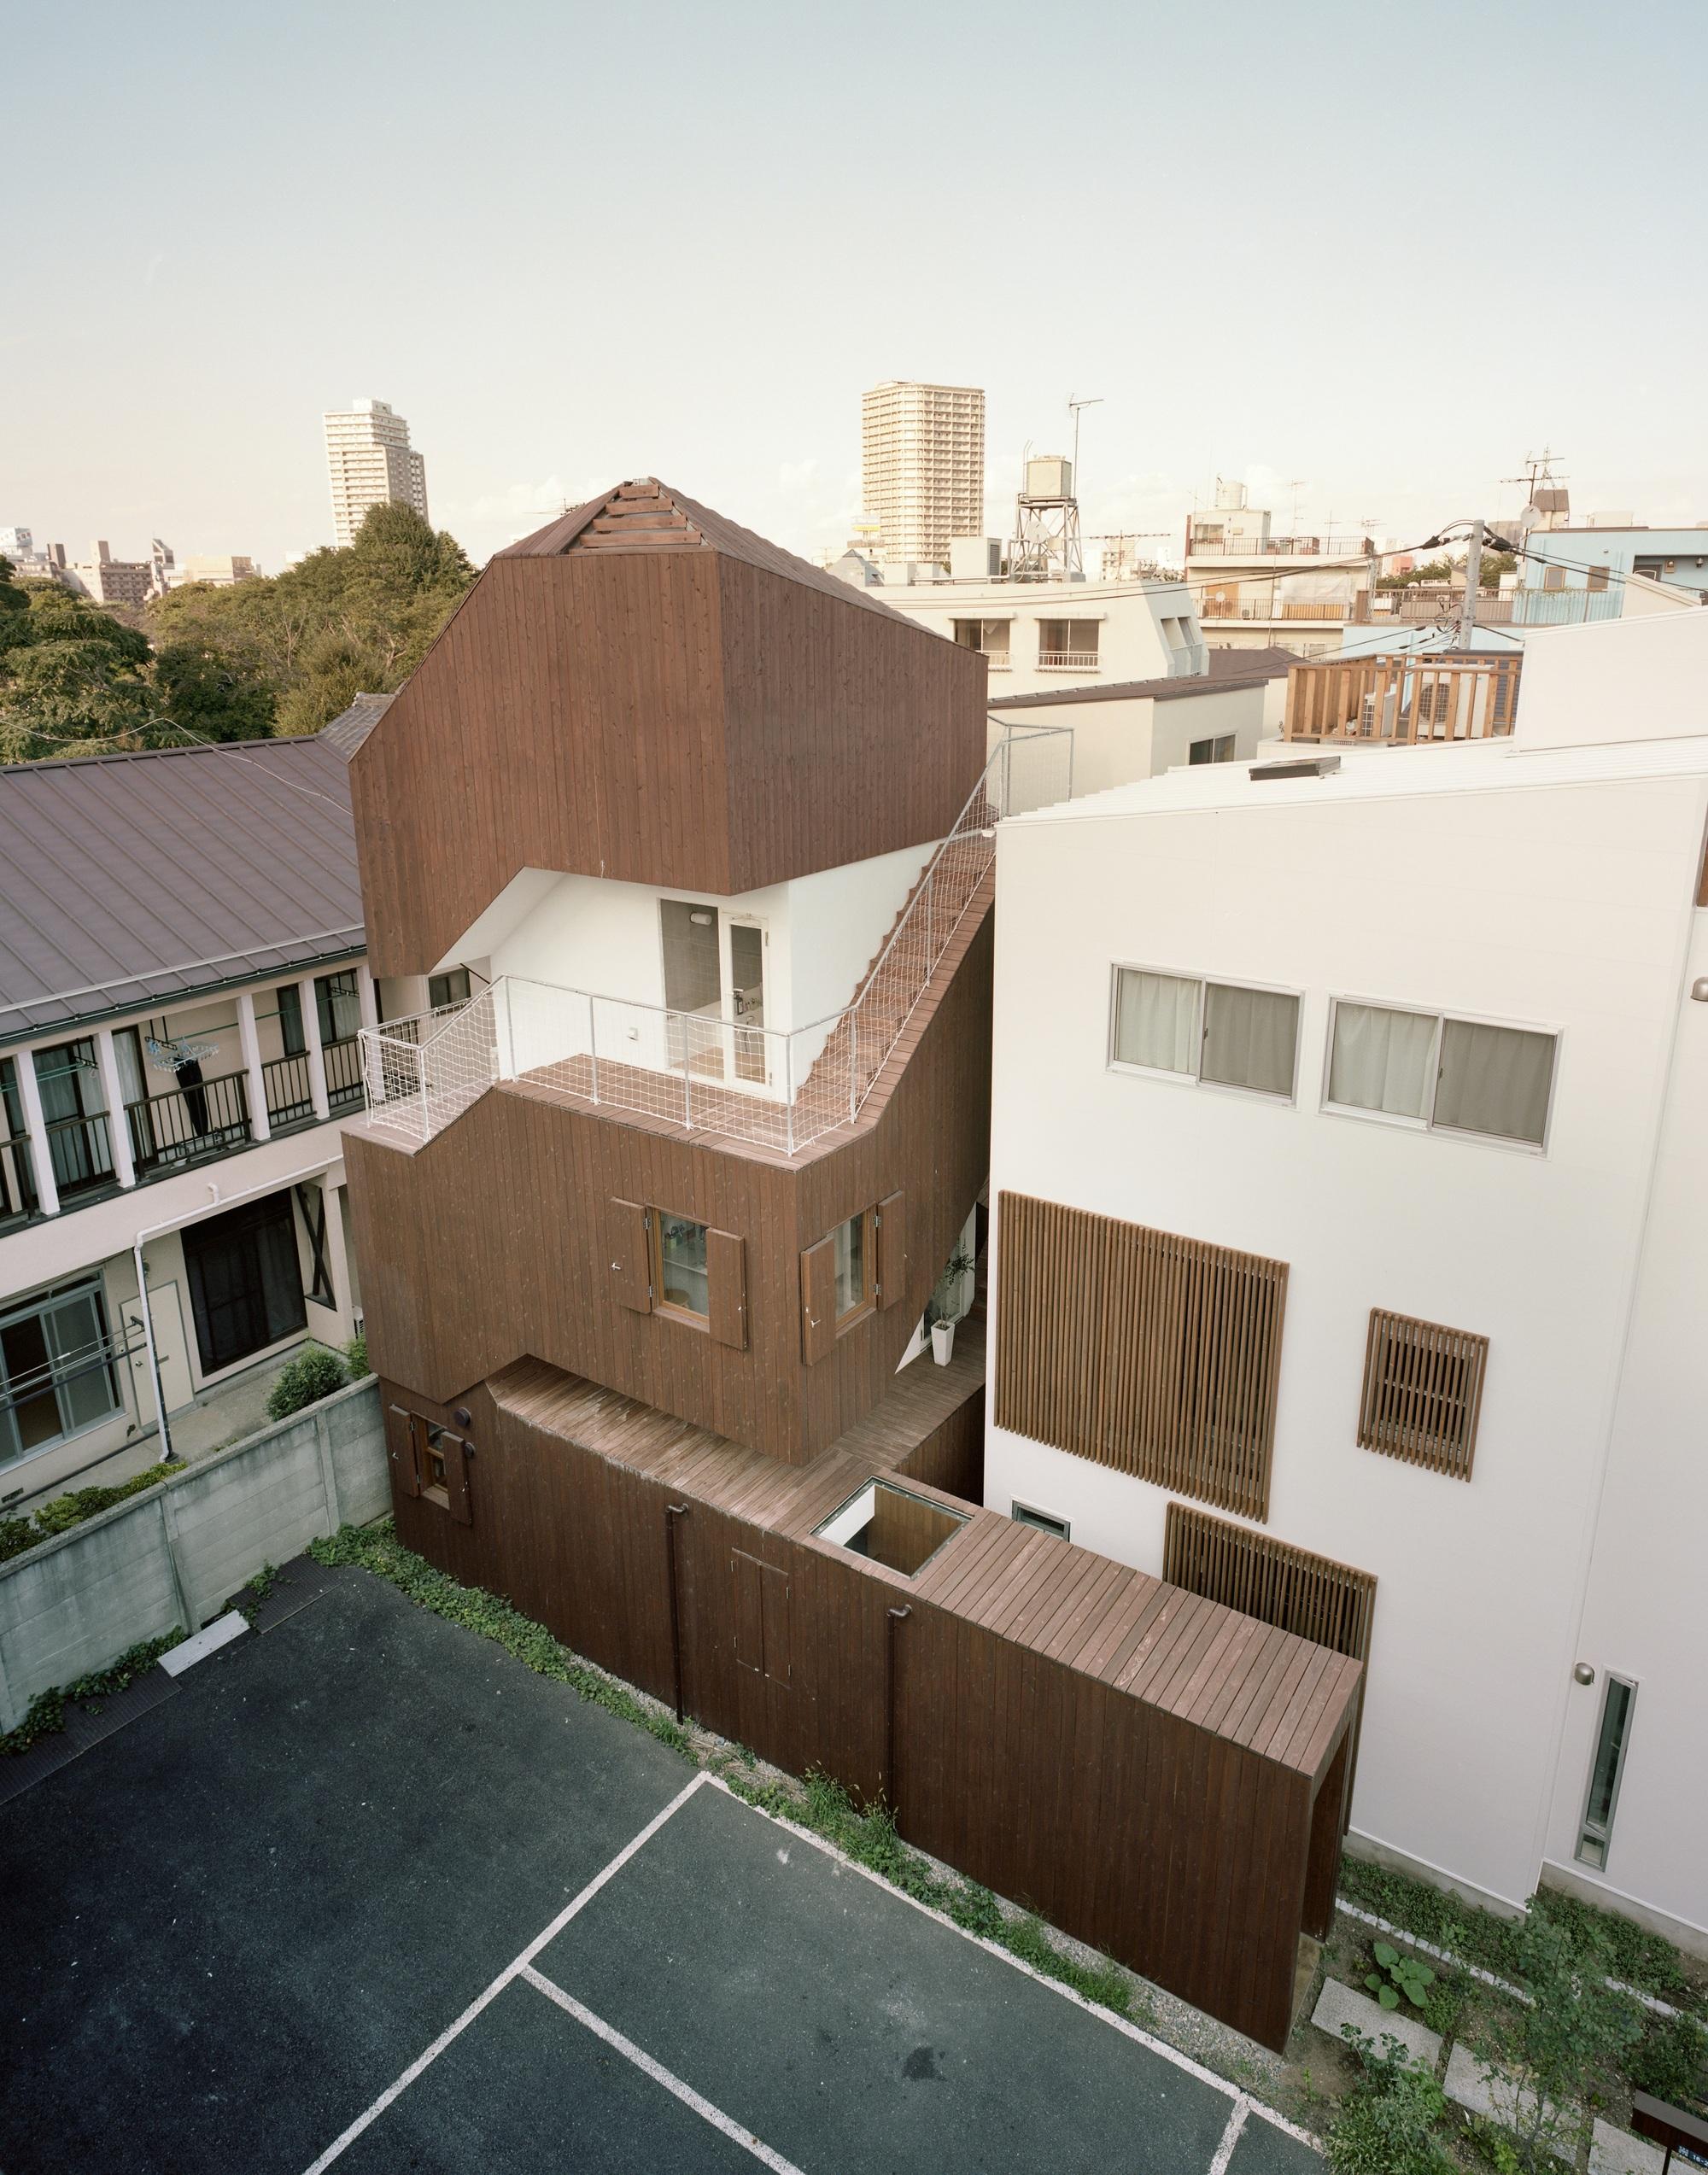 Double Helix House Onishimaki Hyakudayuki Architects Archdaily